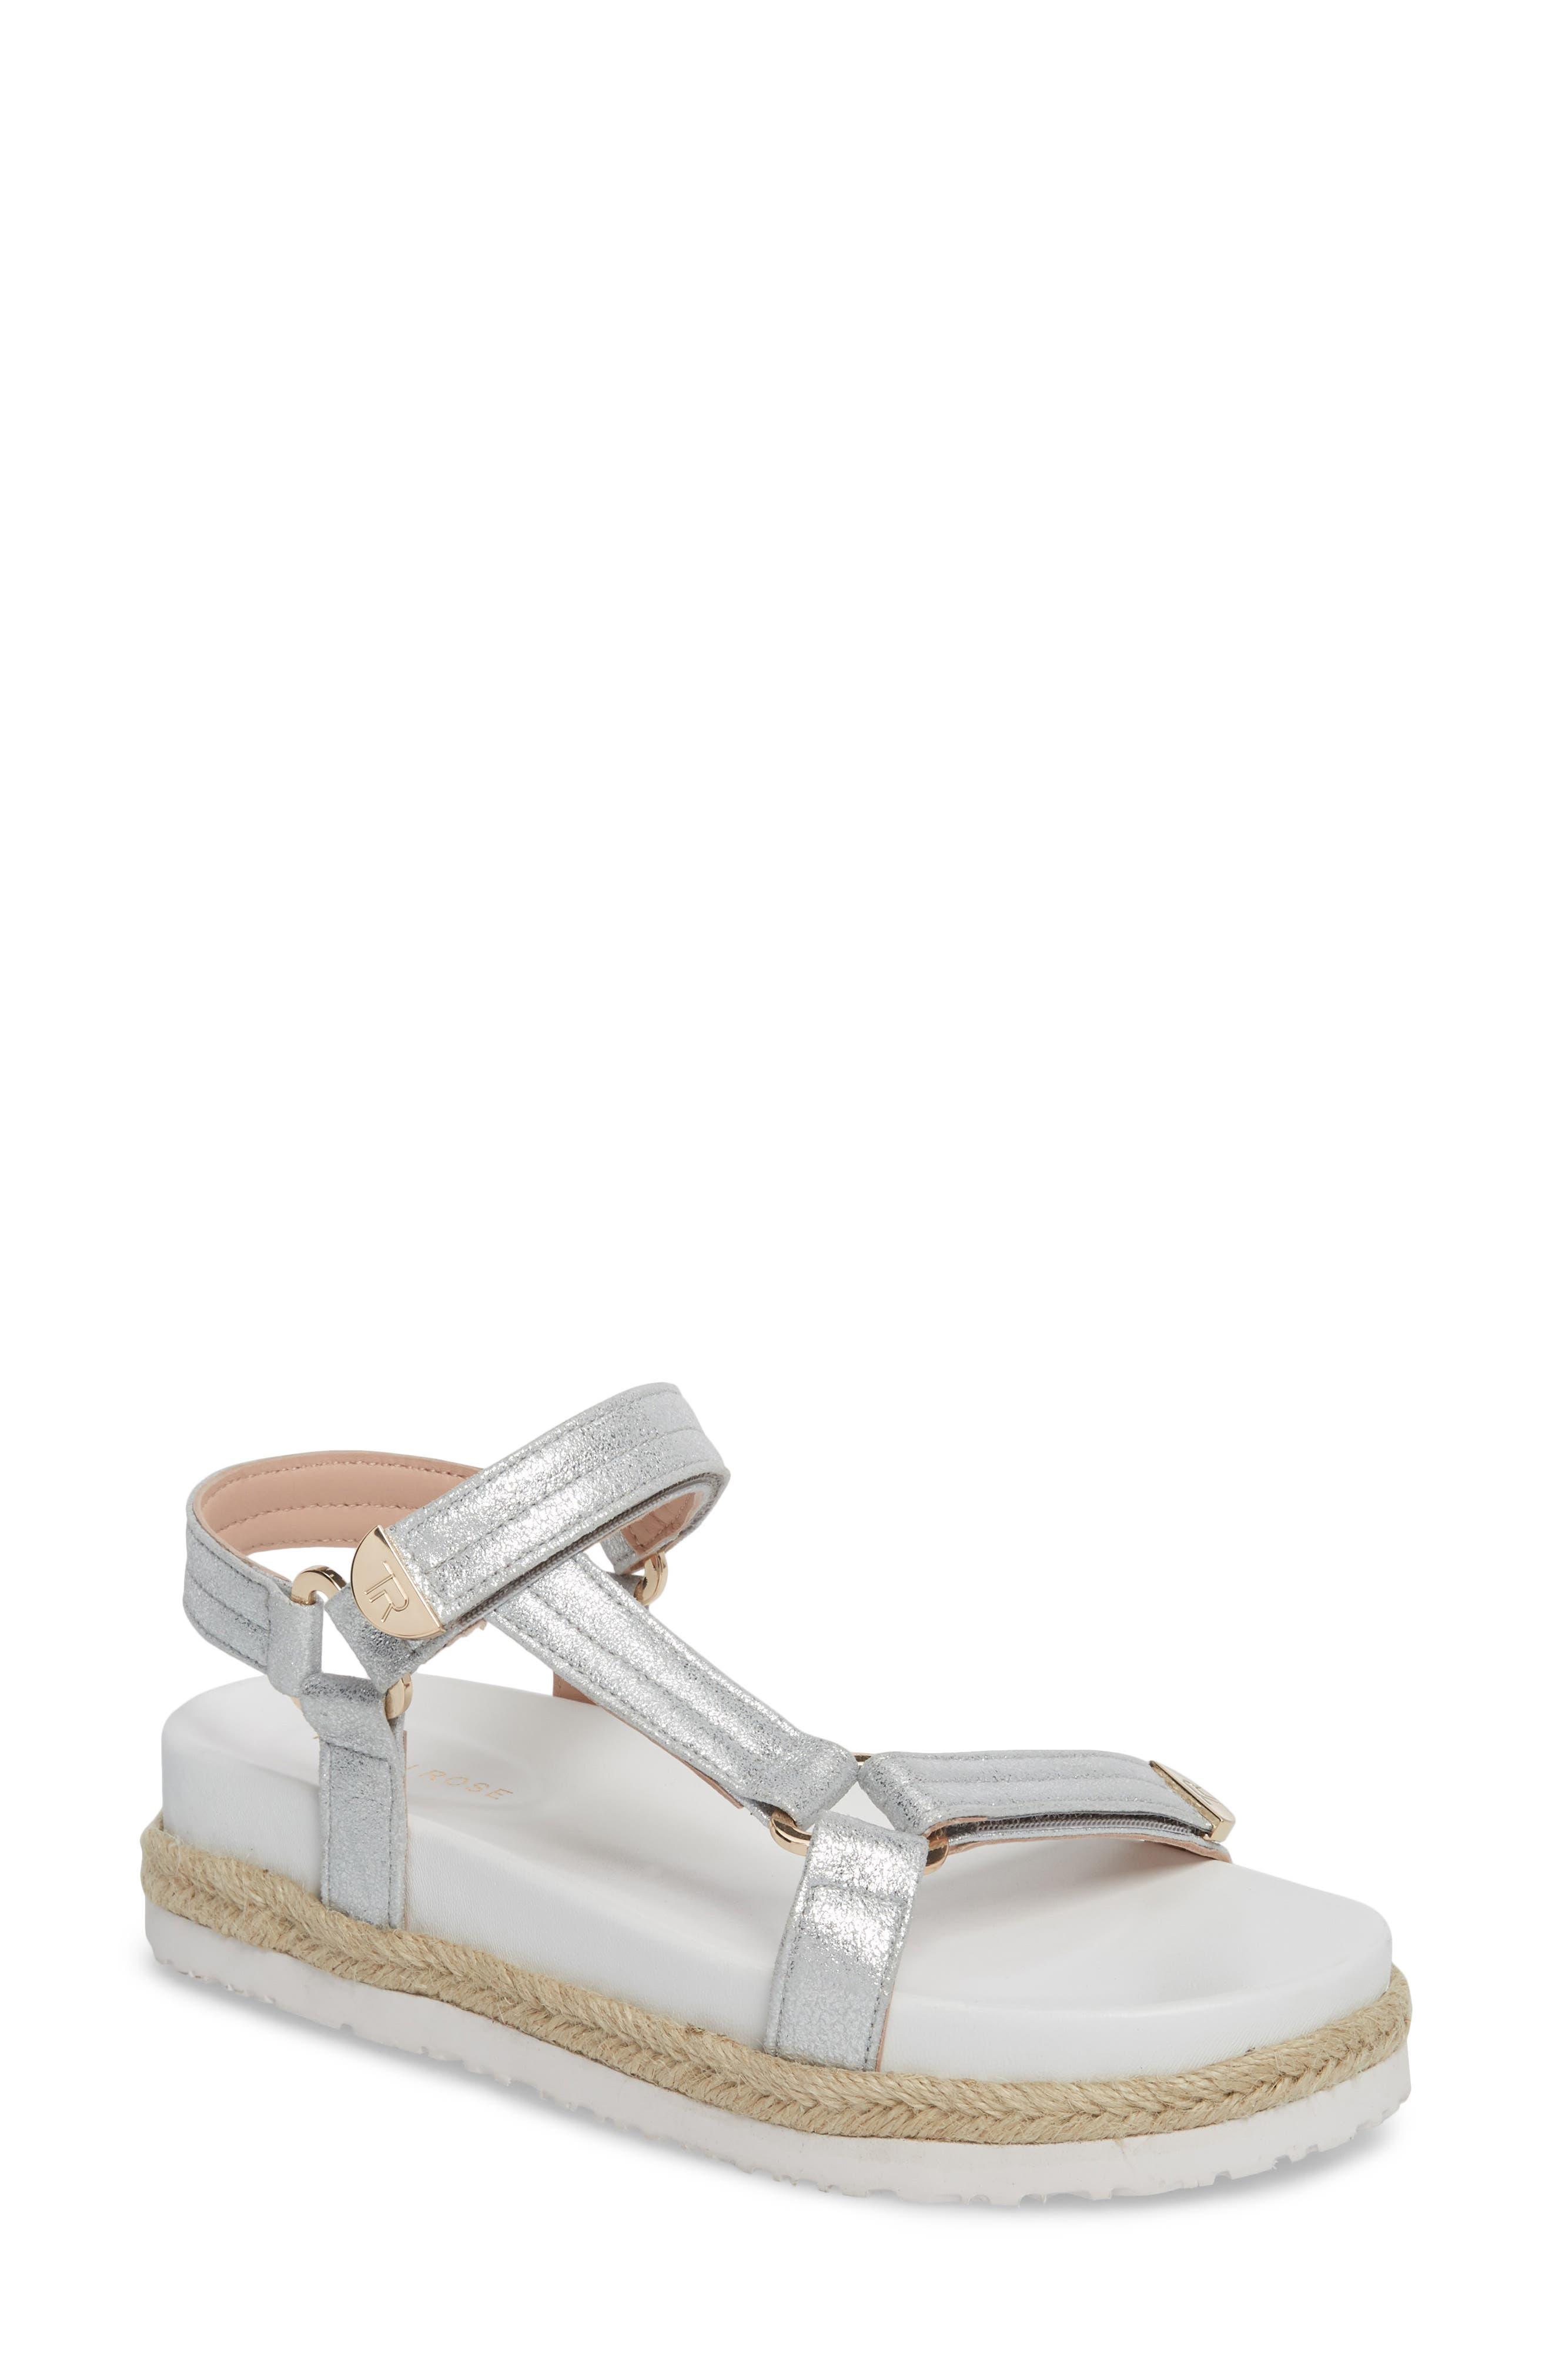 Lydia Platform Sport Sandal,                         Main,                         color, 040